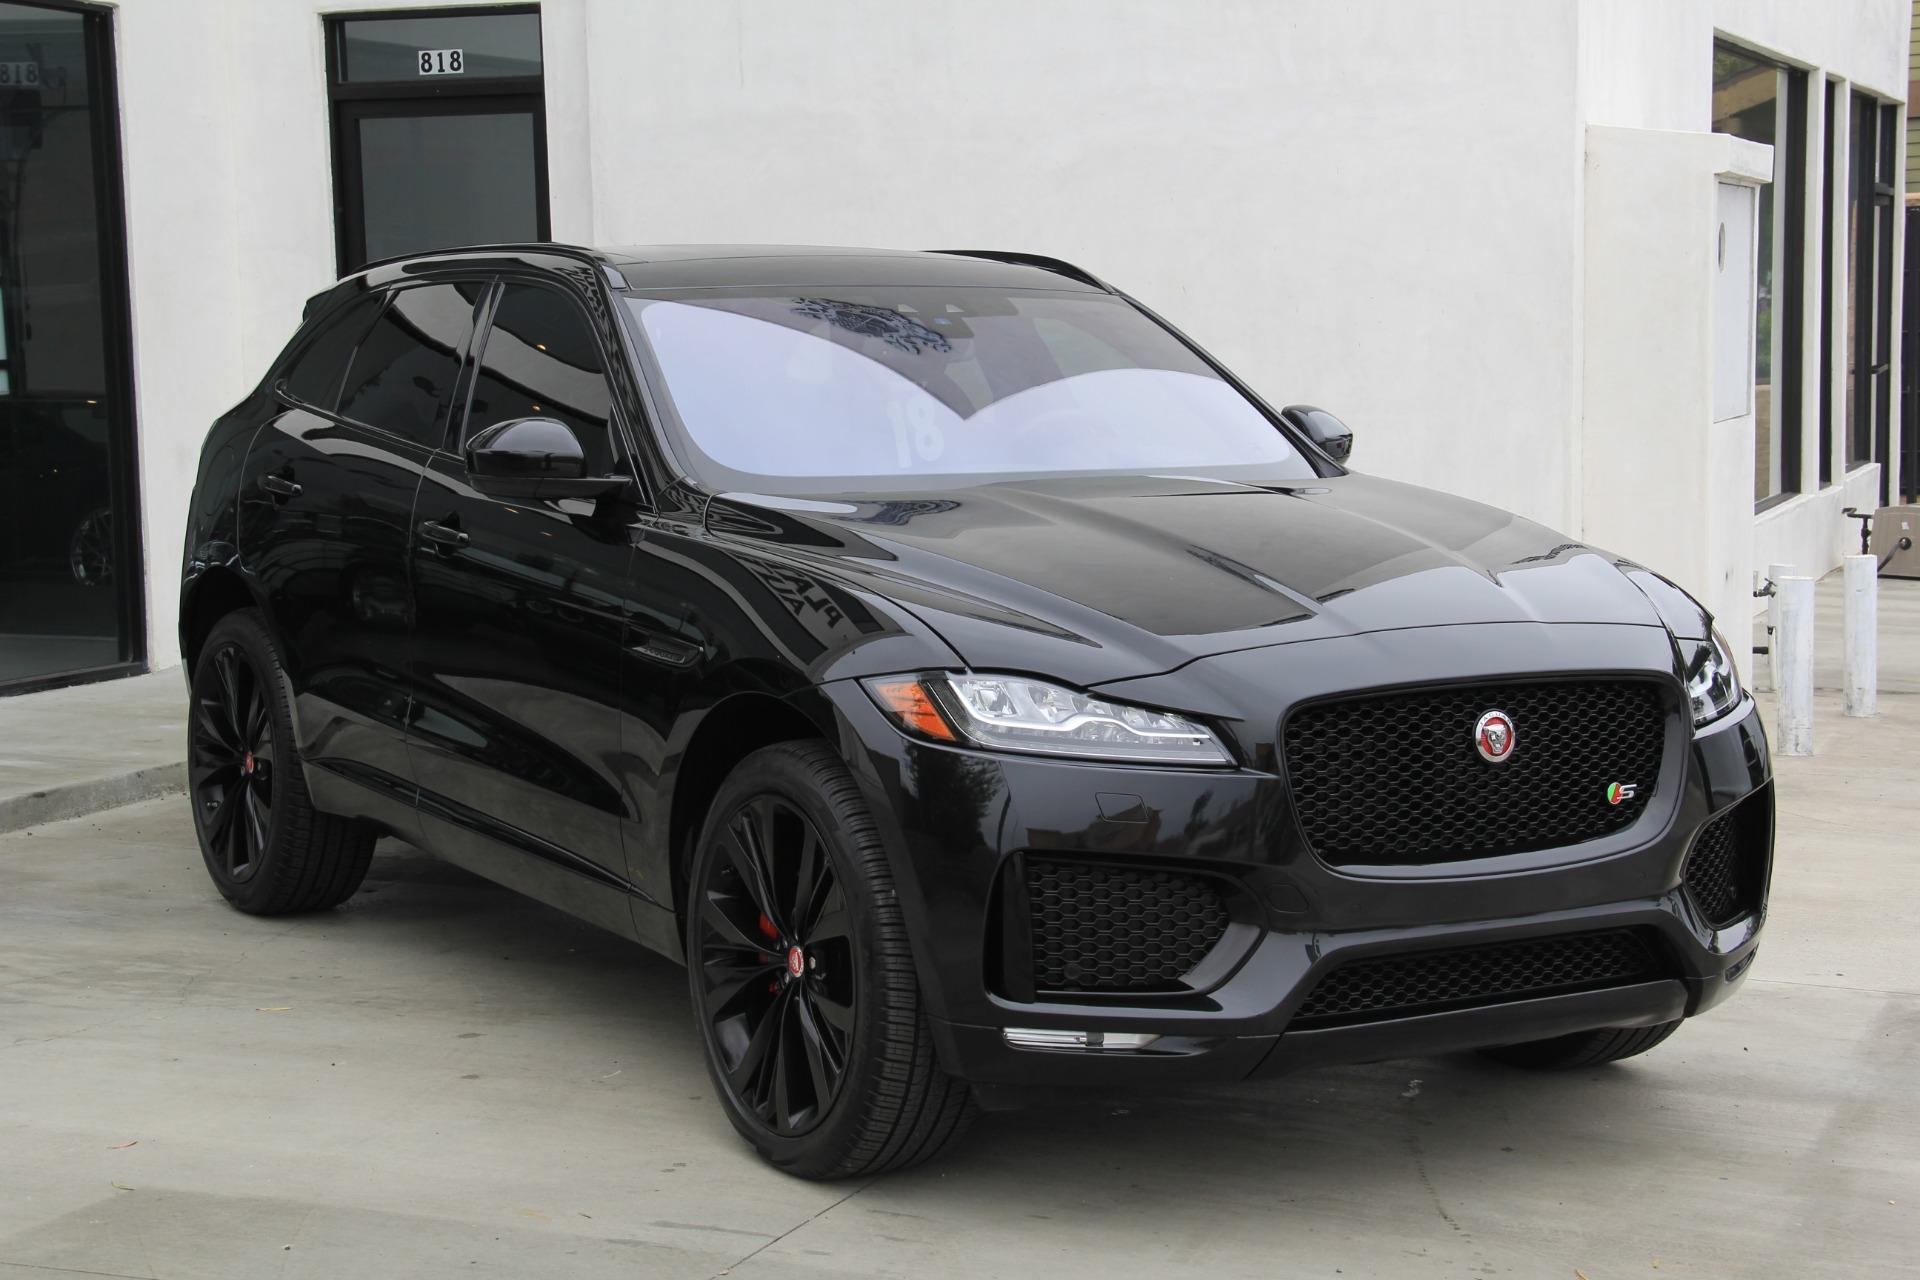 2018 Jaguar F Pace S Stock 6310 For Sale Near Redondo Beach Ca Ca Jaguar Dealer